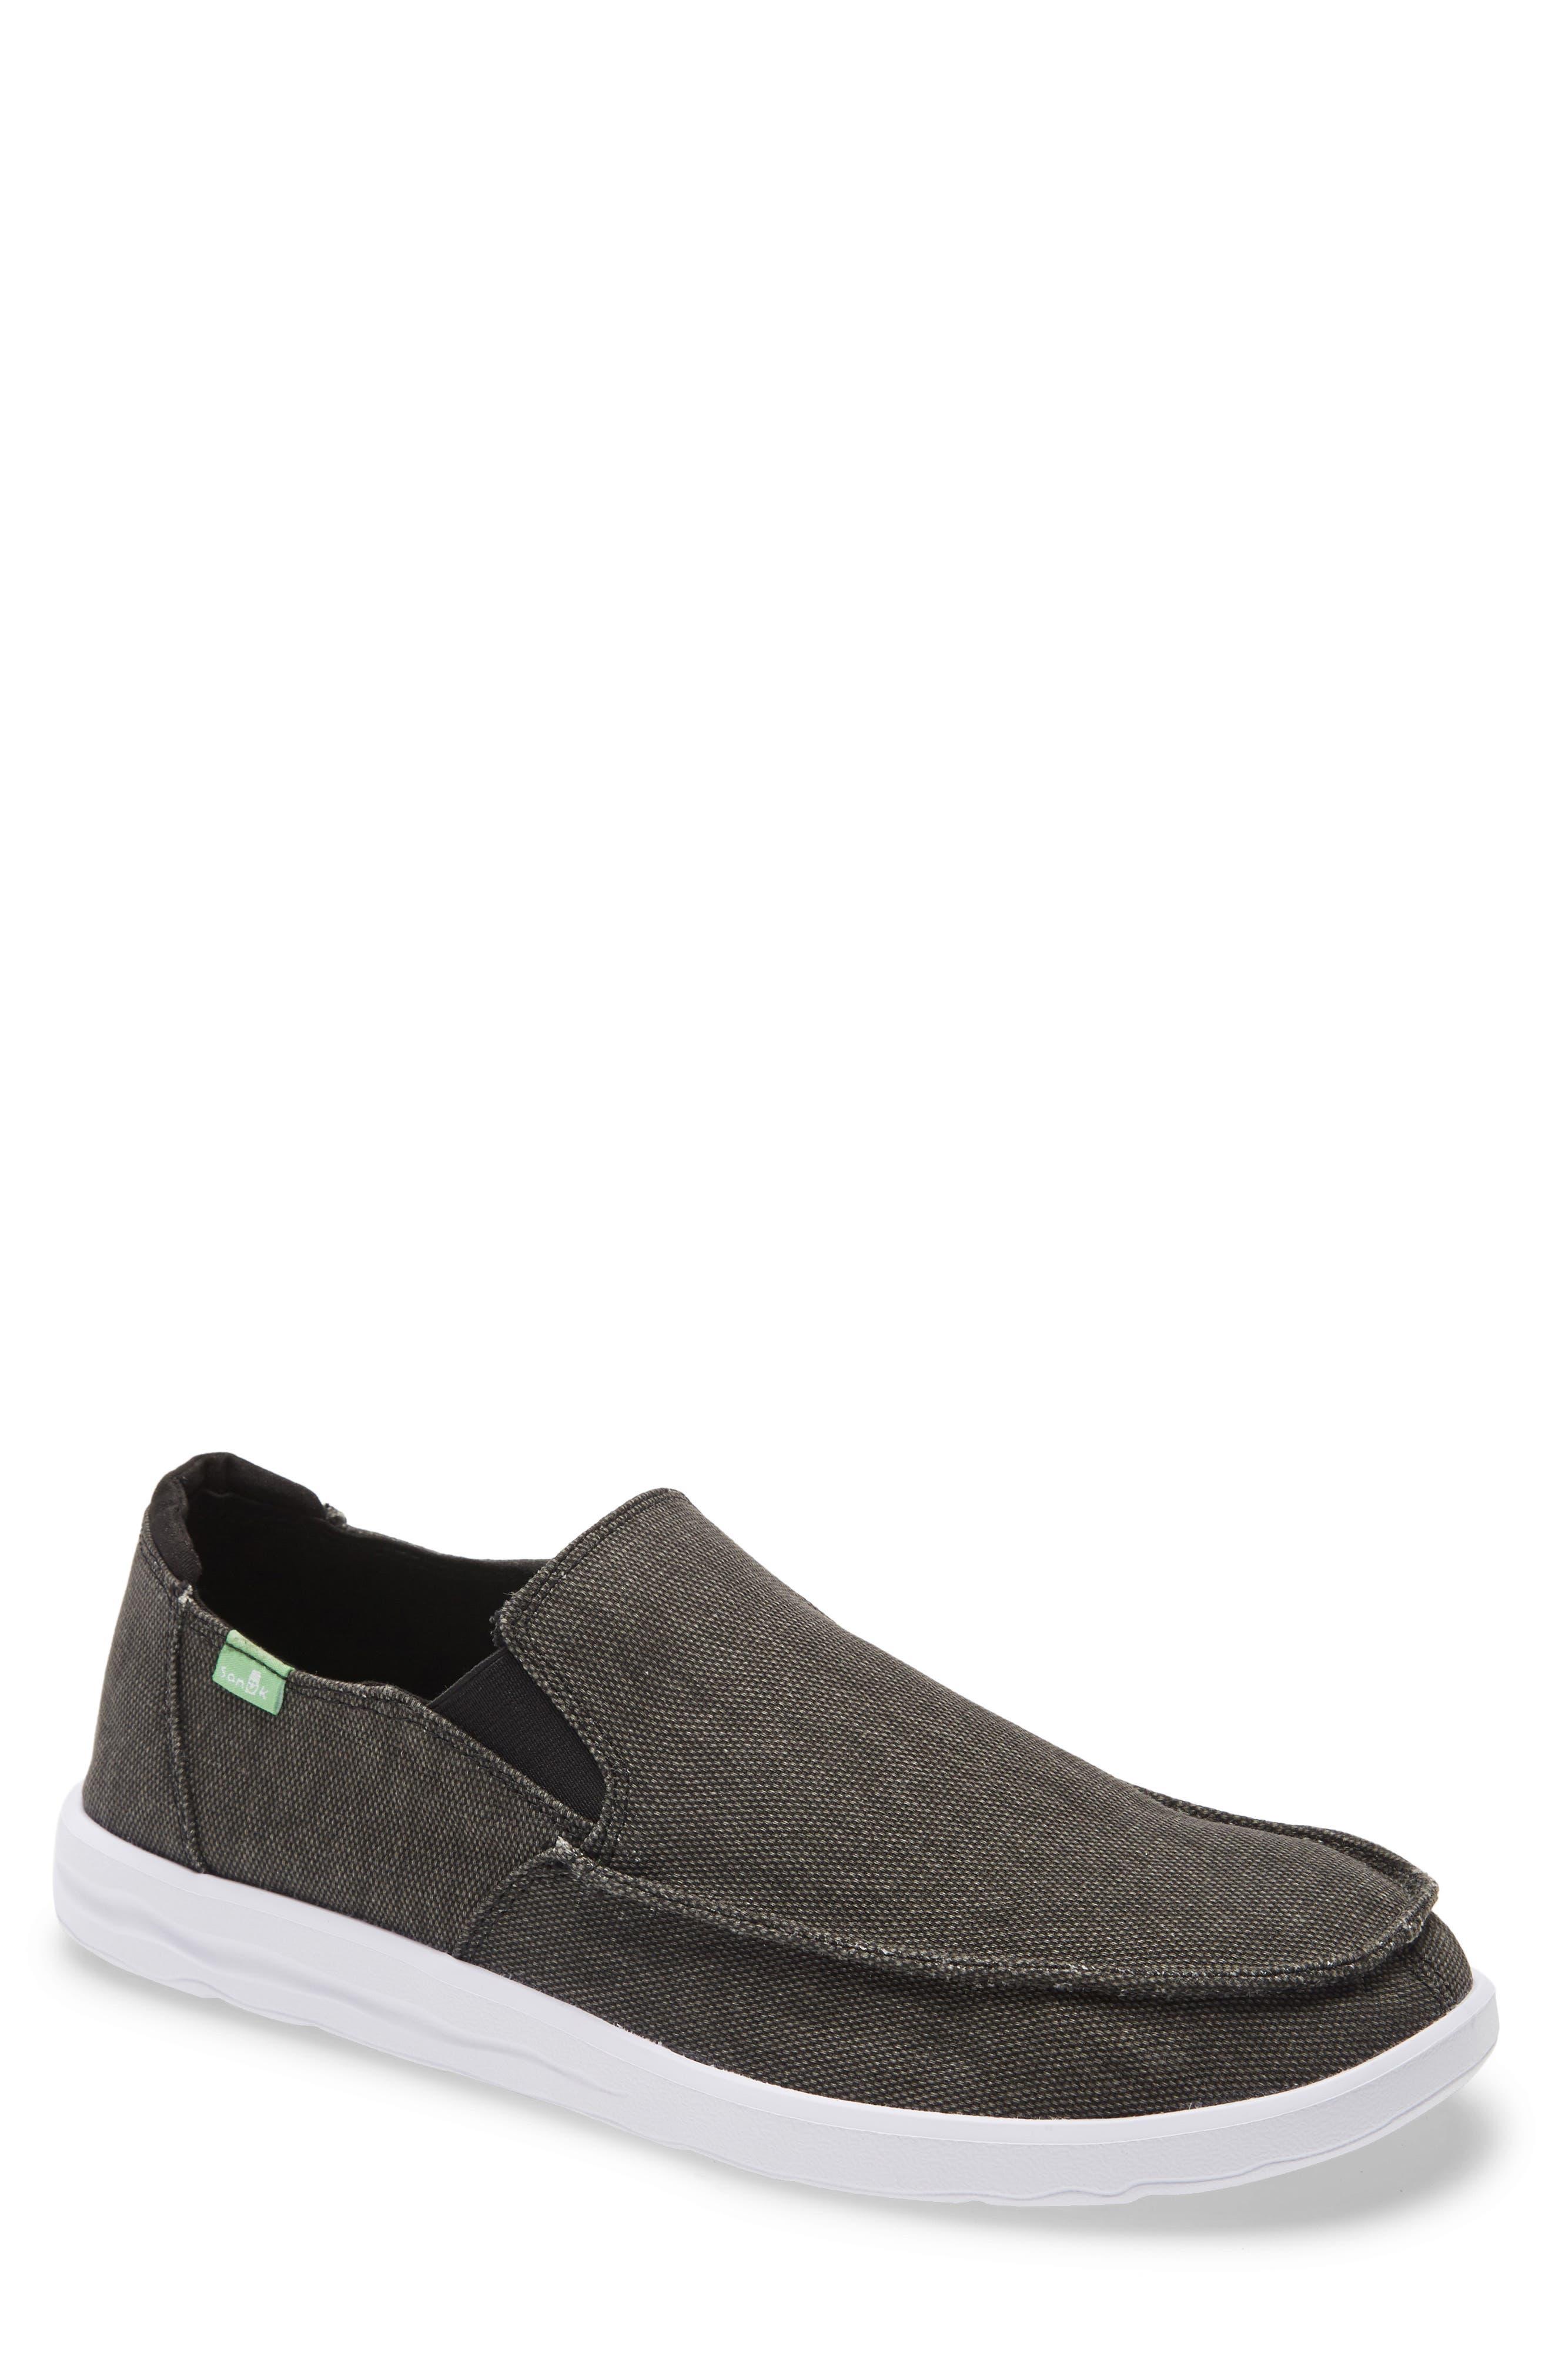 Sanuk Shoes Sale \u0026 Clearance | Nordstrom